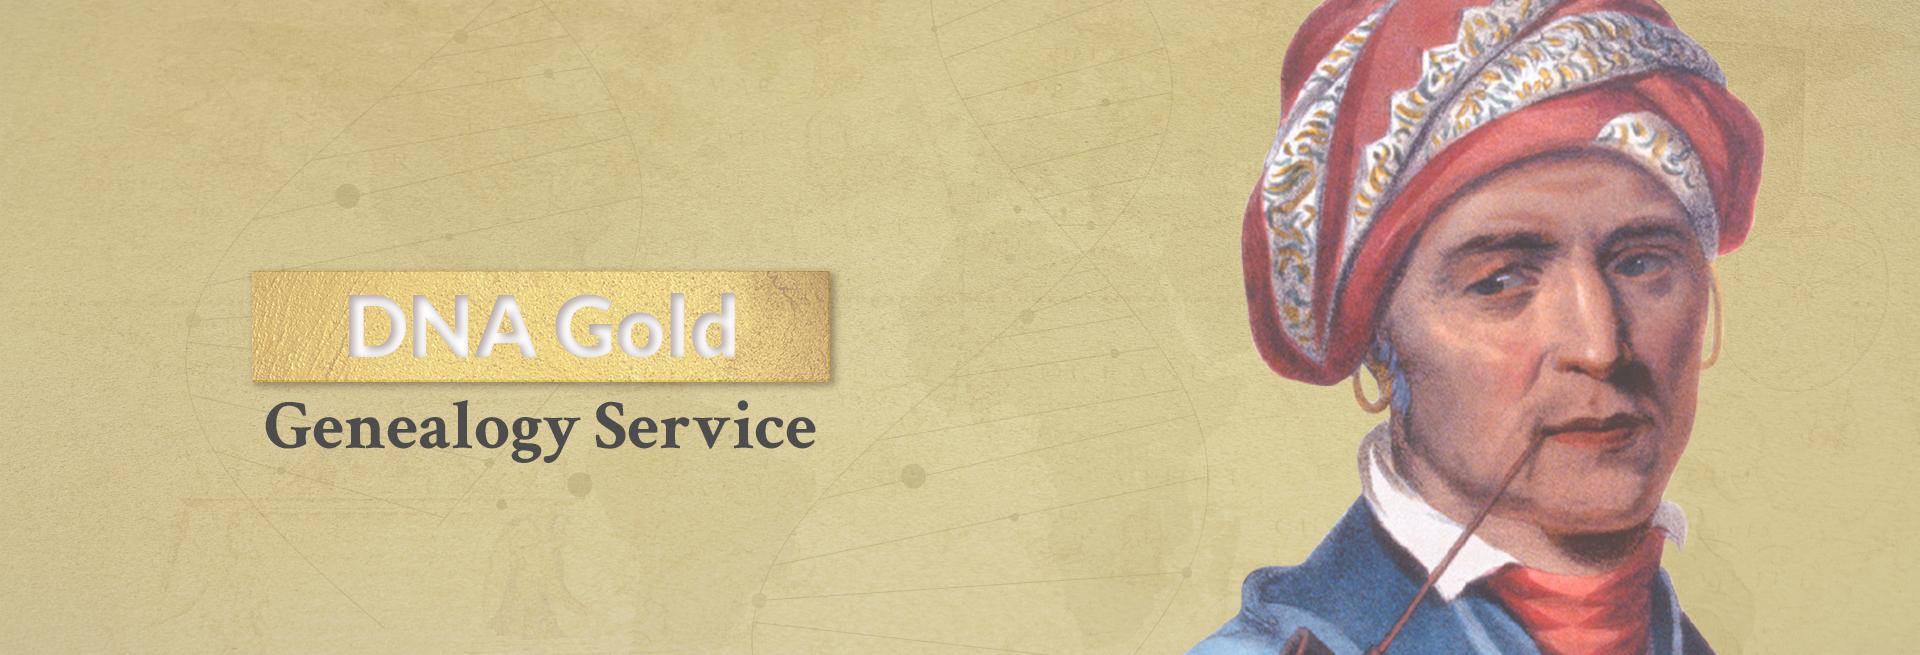 DNA Gold Genealogy Service